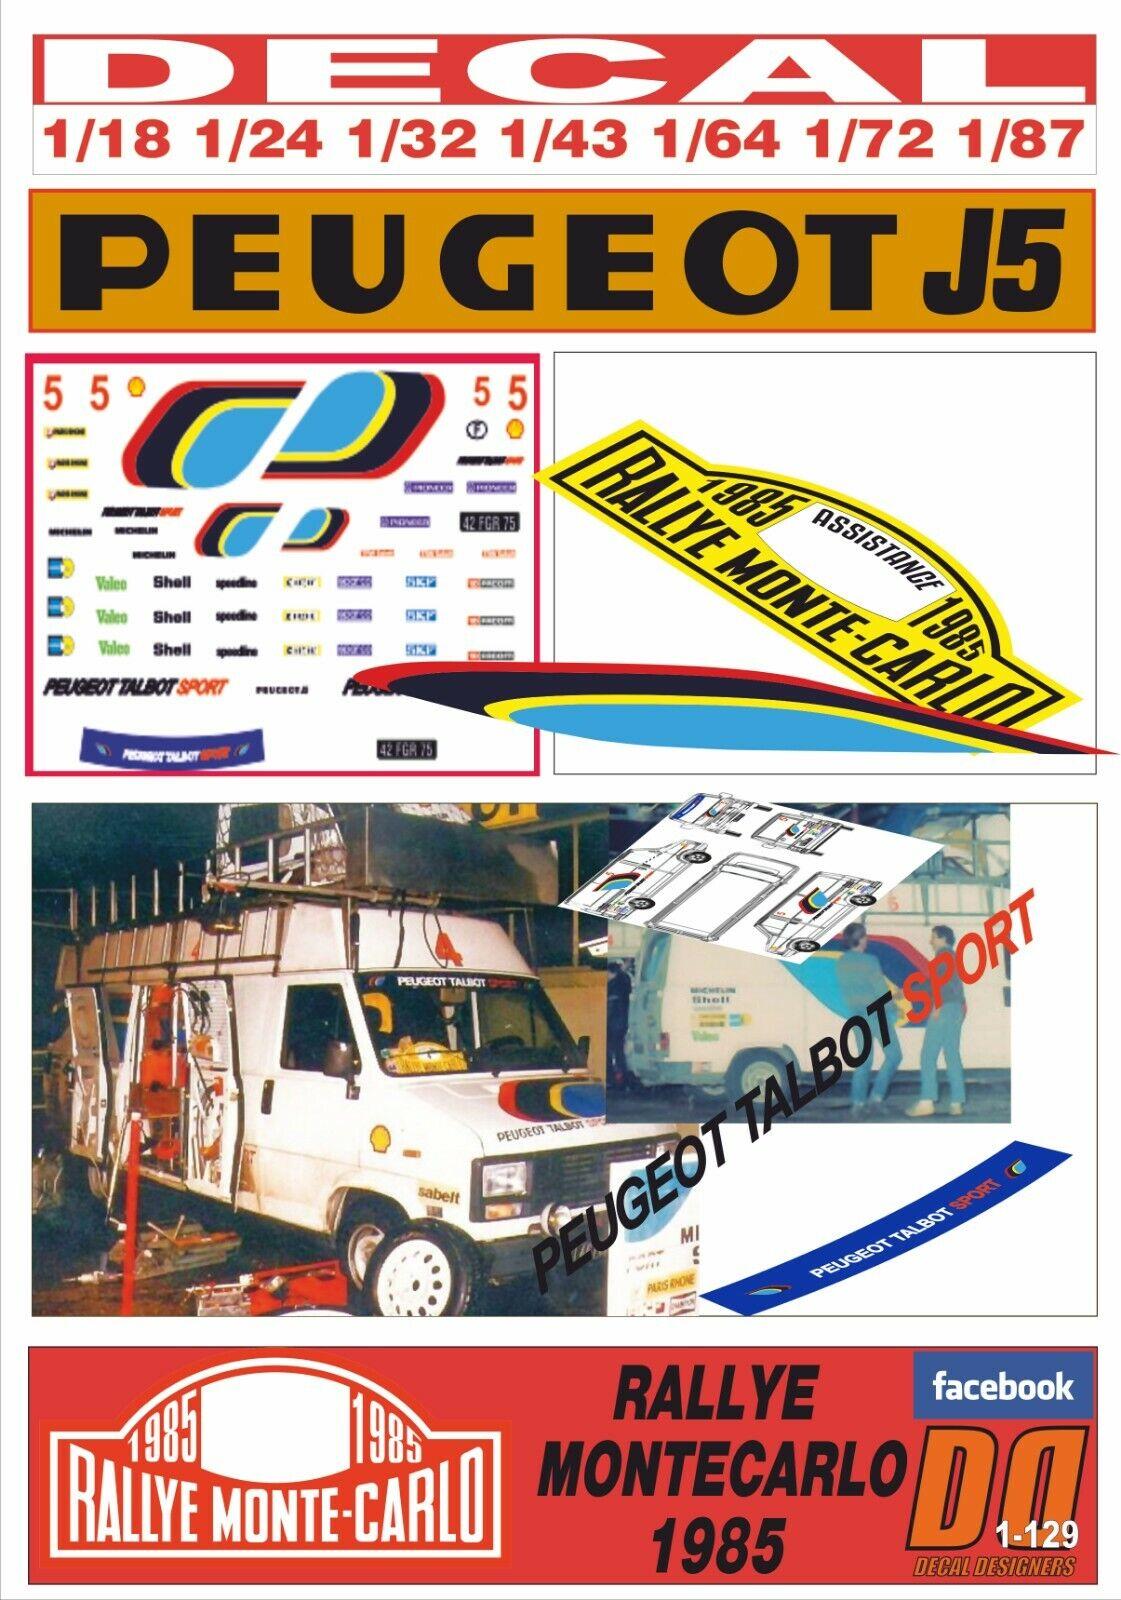 DECAL PEUGEOT J5 - PEUGEOT ASISTANCE rallyE MONTEbilLO 1985 (01)